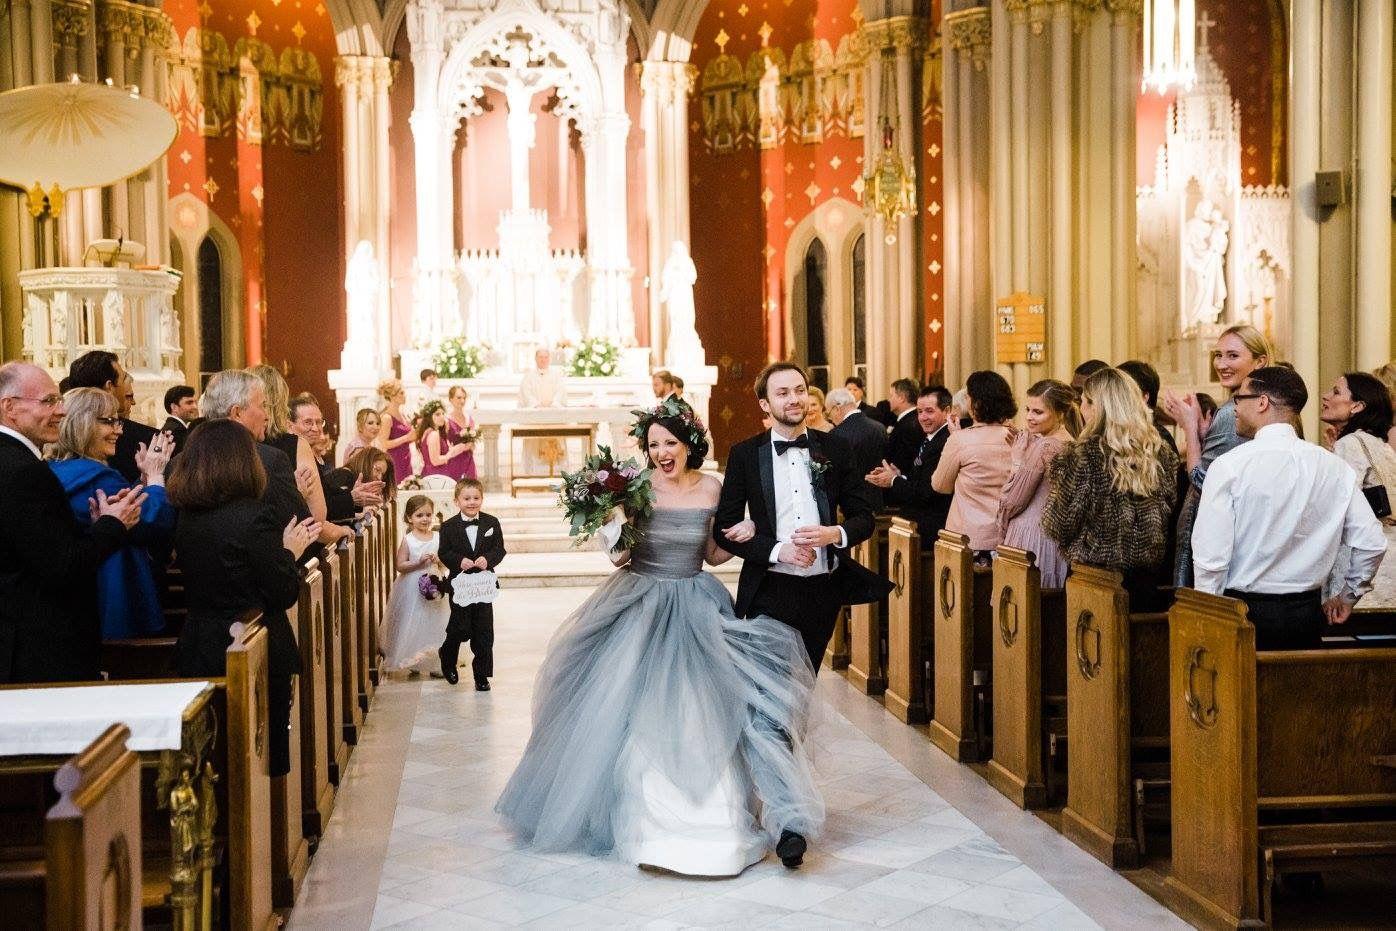 Sareh nouri marie antionette gray dress new orleans wedding sareh